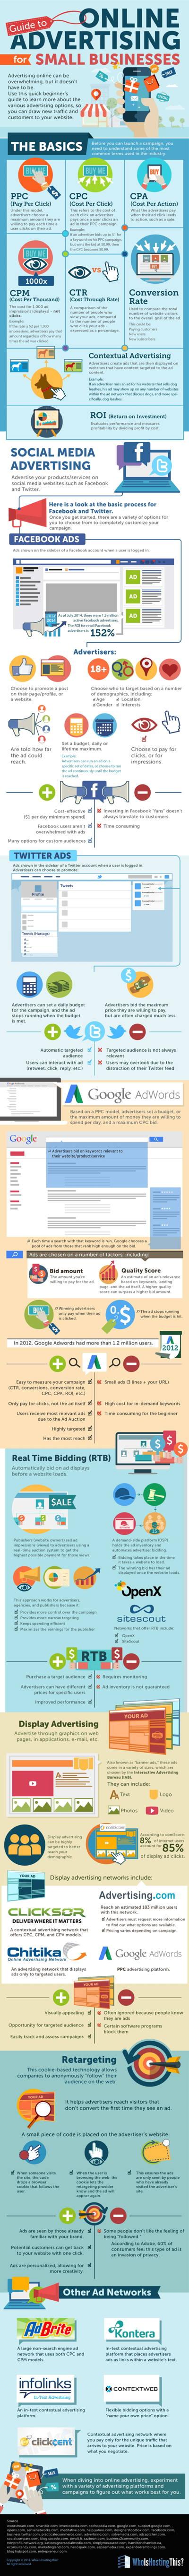 guia-publicidad-online-pymes-infografia